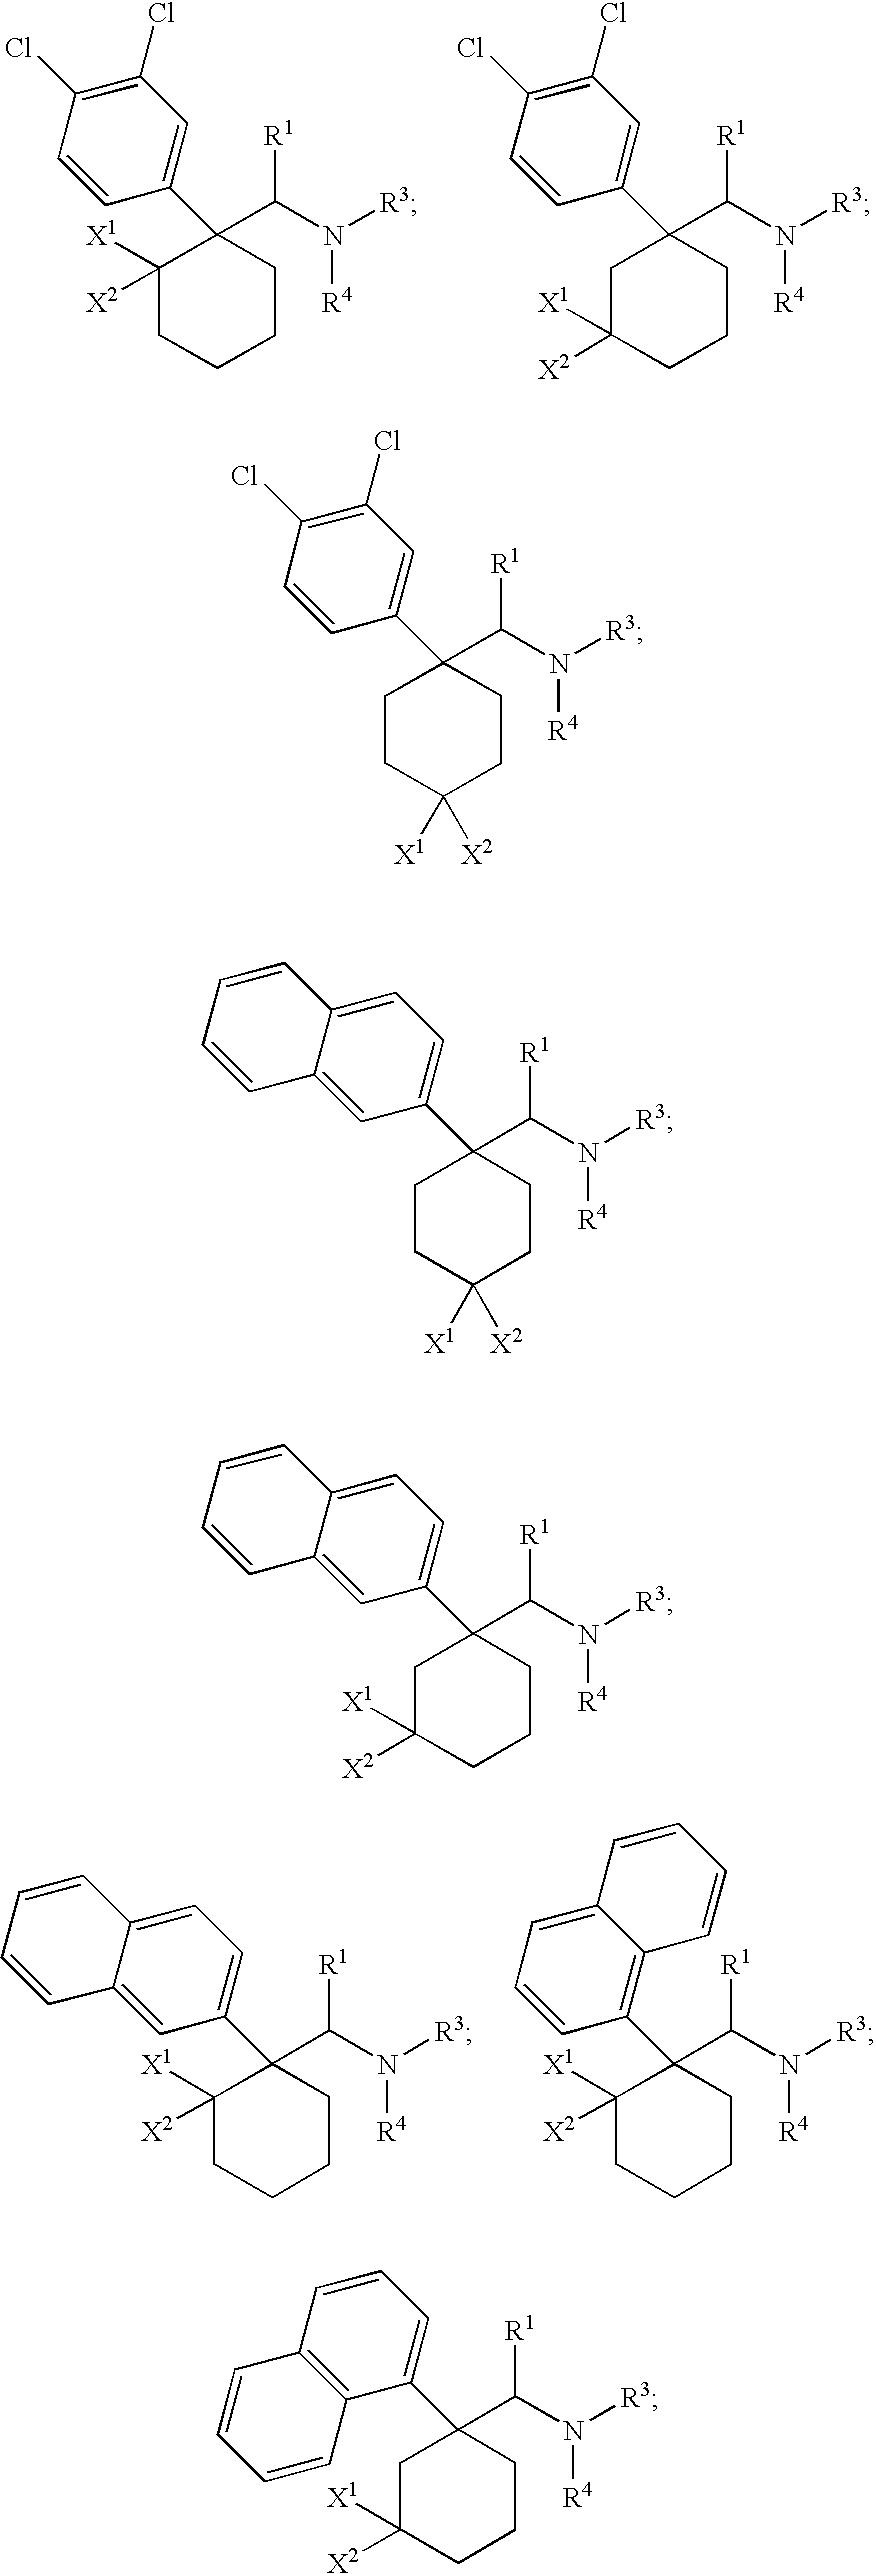 US8877975B2 - Cycloalkylamines as monoamine reuptake inhibitors